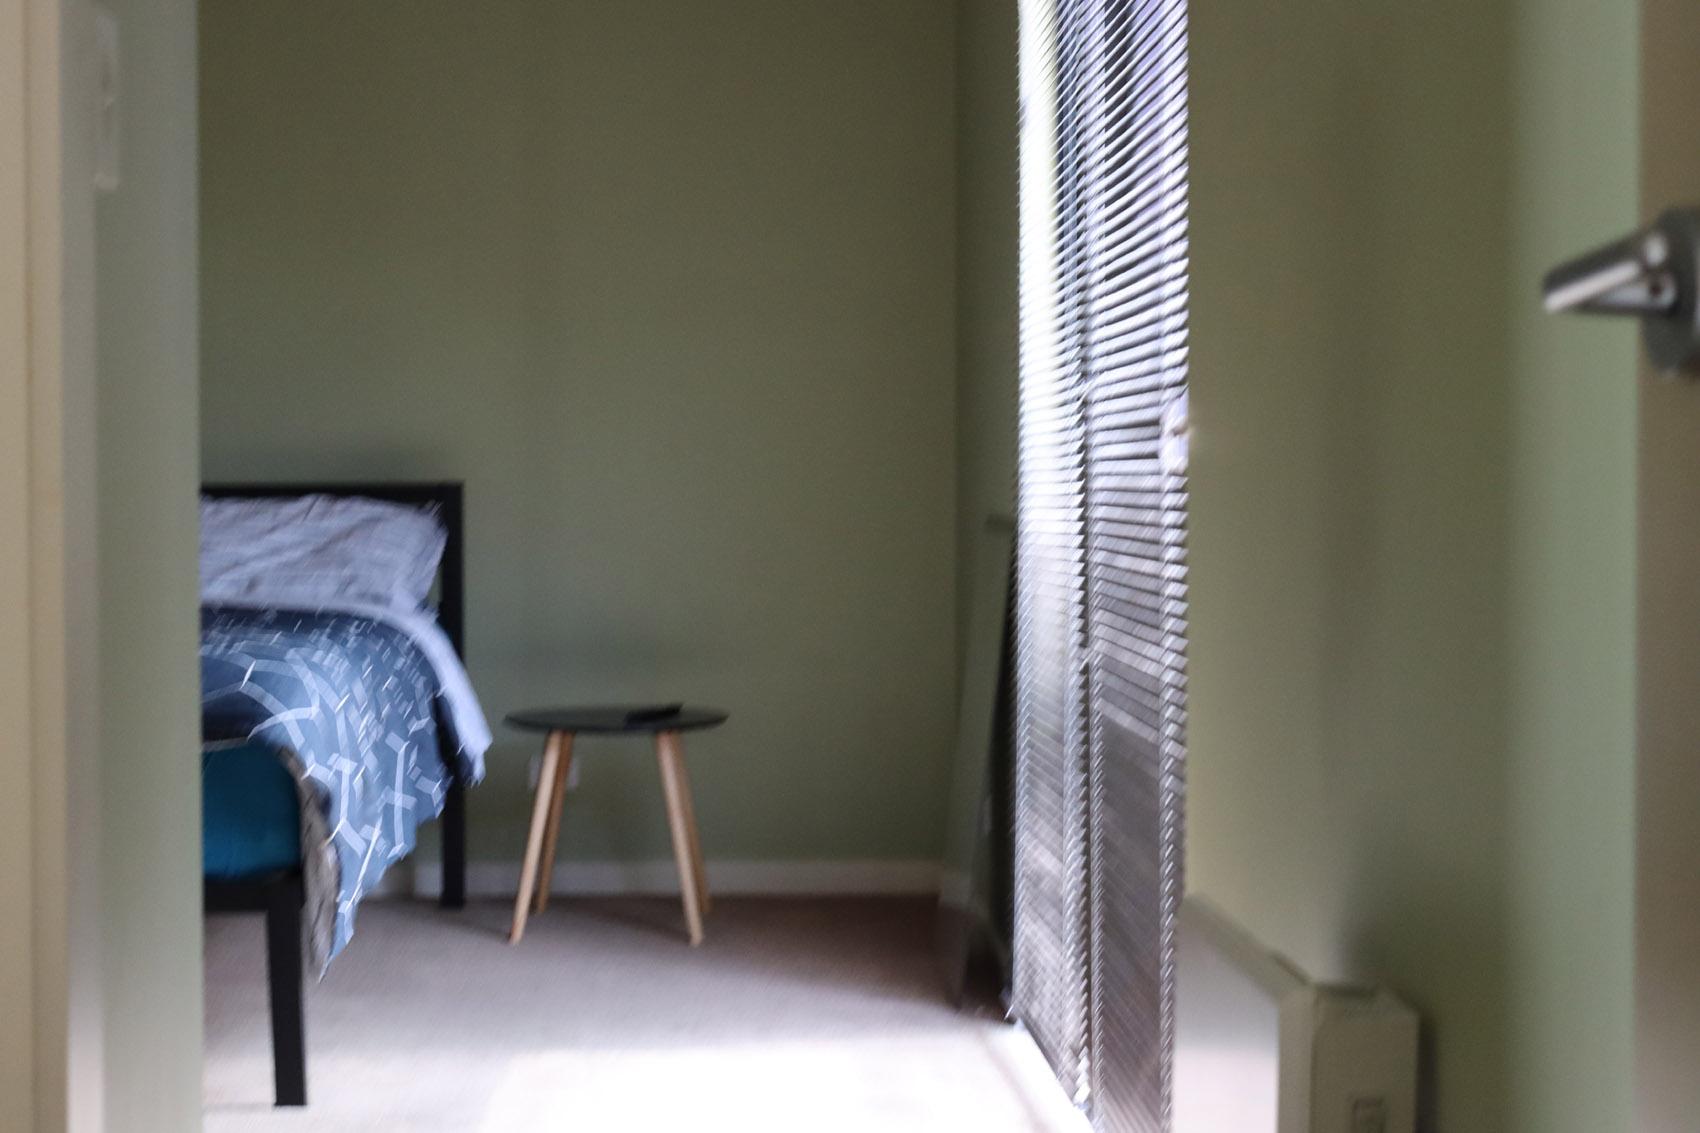 bellerive-tasmania-independent-living-respite-care-NDIS-11-feb-15